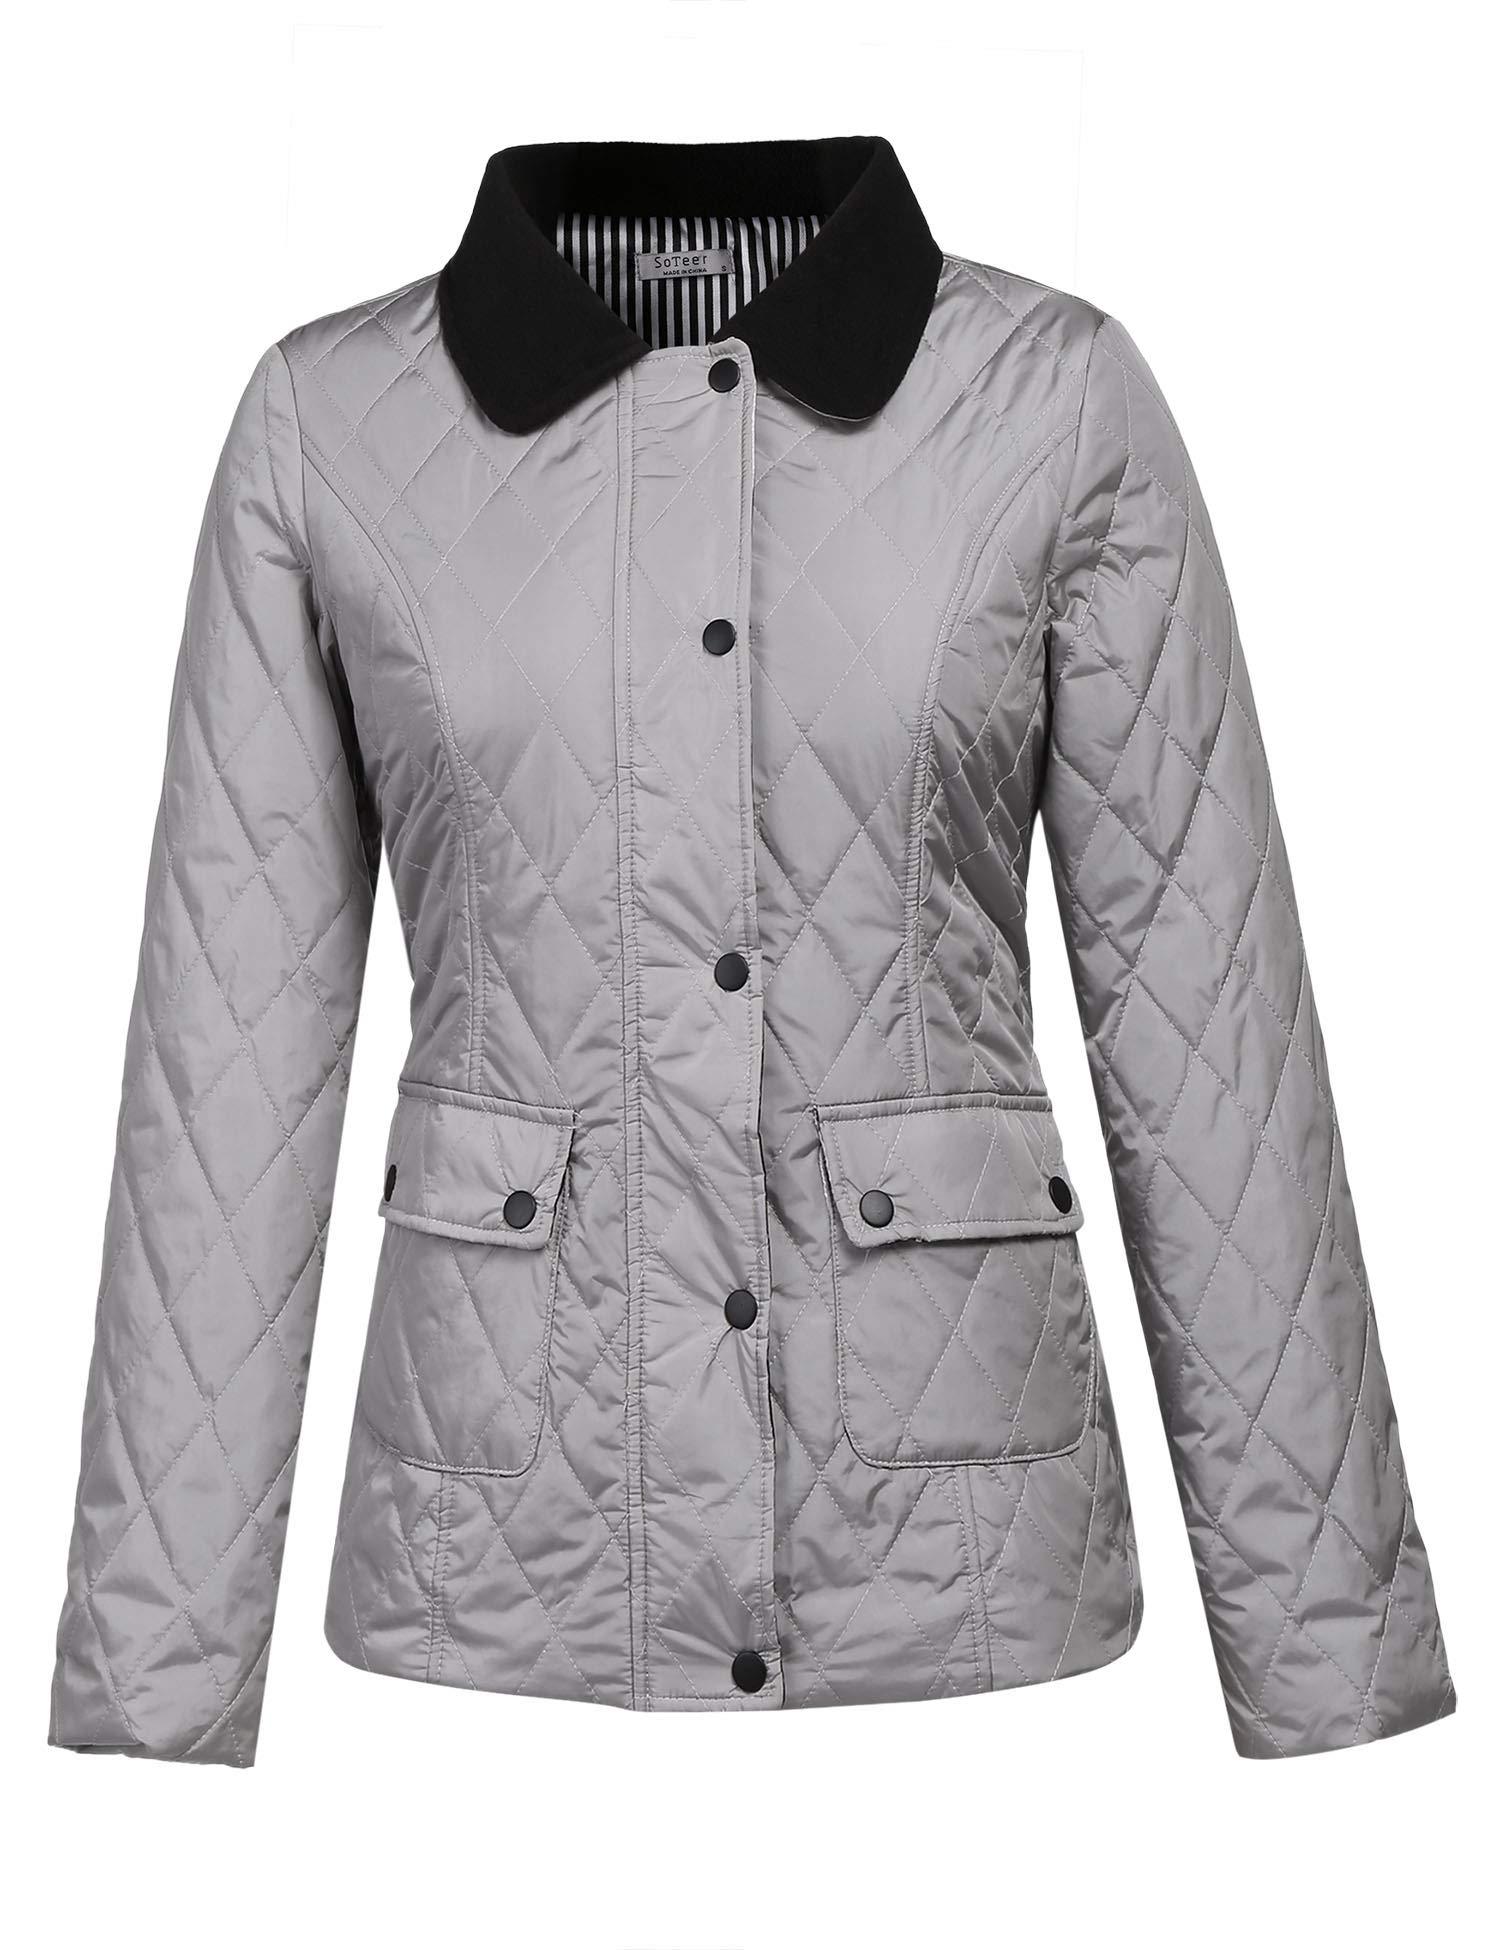 Pinsparkle Women Quilted Lightweight Diamond Jacket Winter Coat Tops Grey S